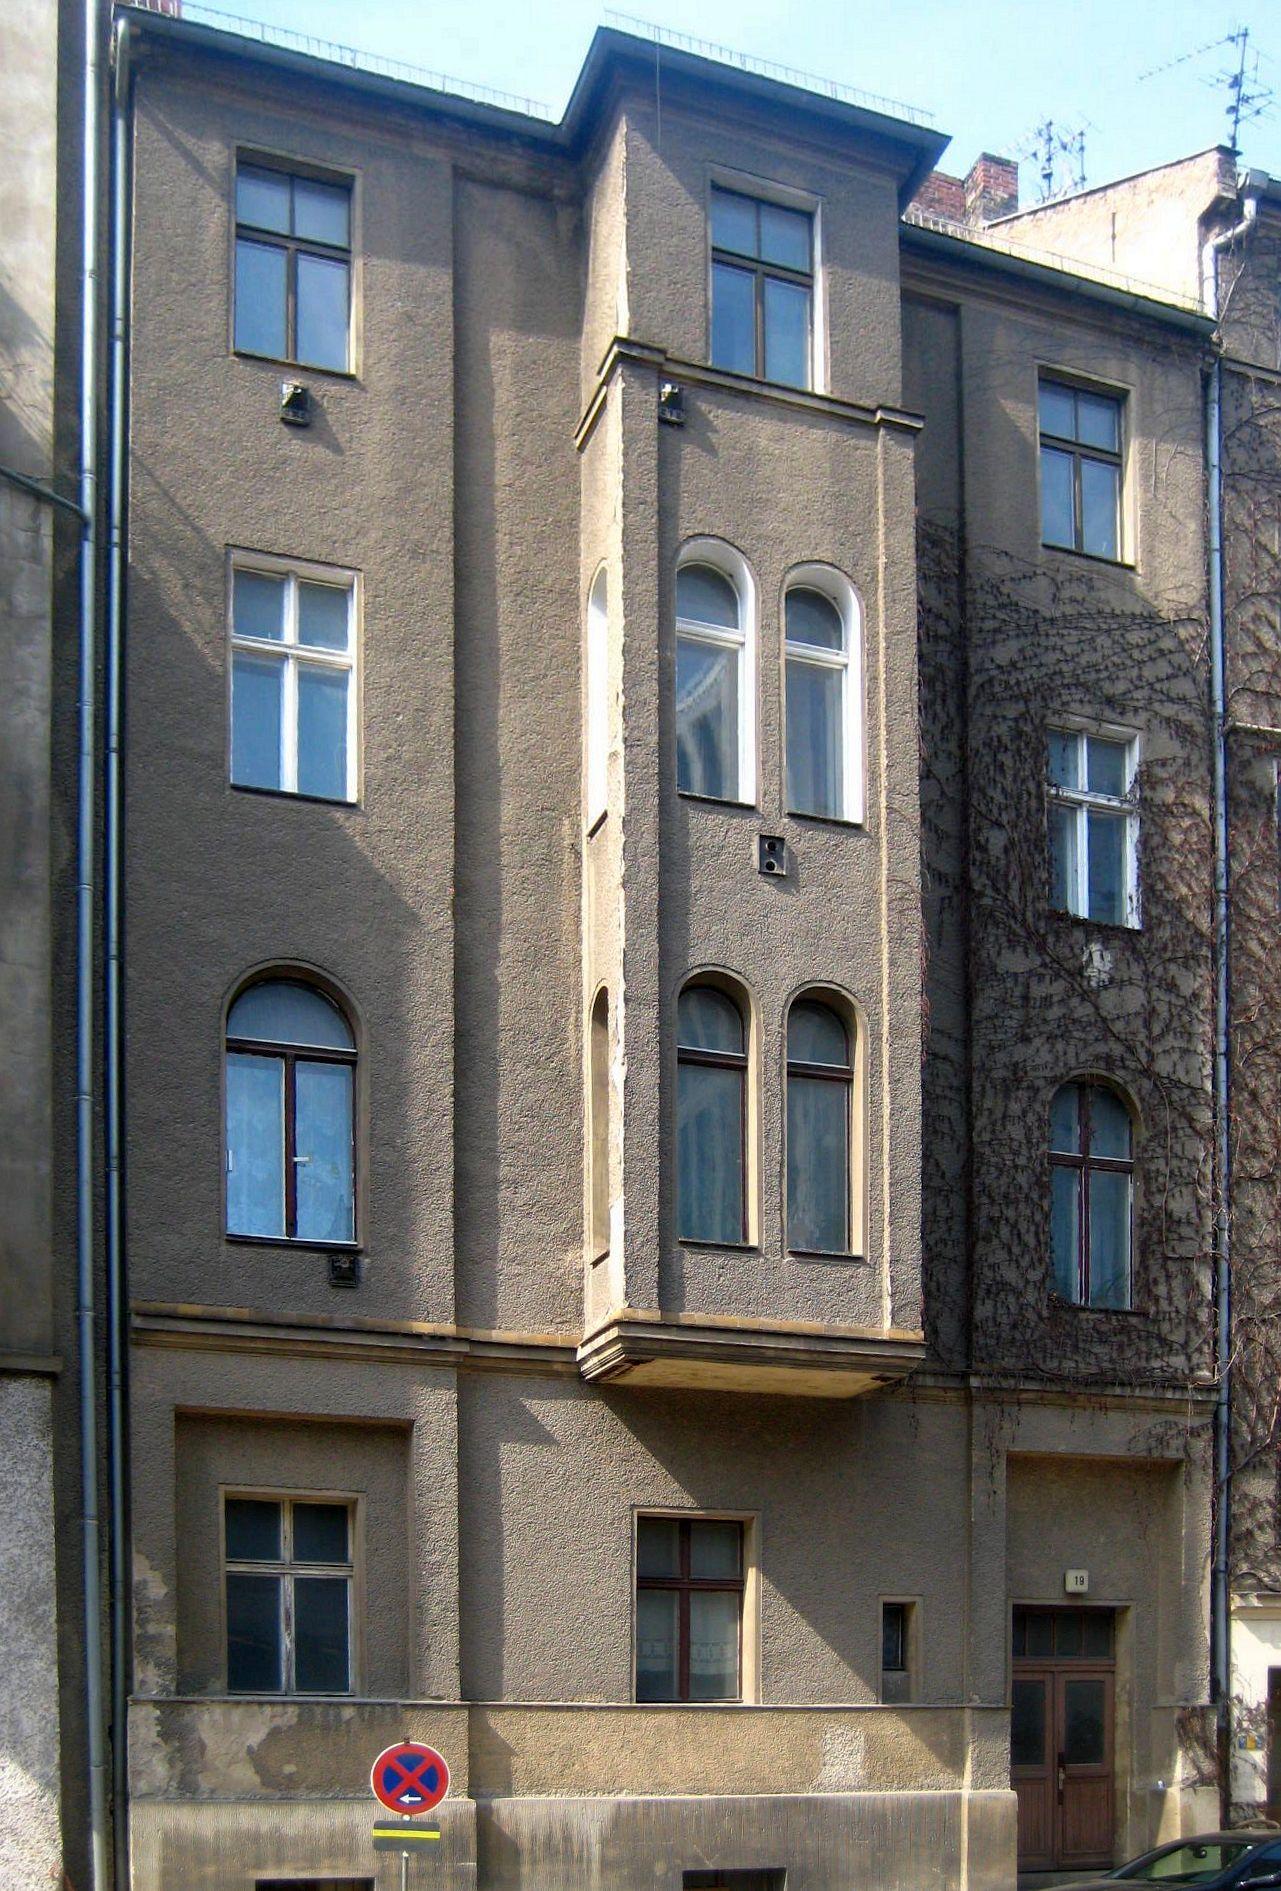 Fileberlin mitte glinkastrasse 19 mietshaus jpg wikimedia